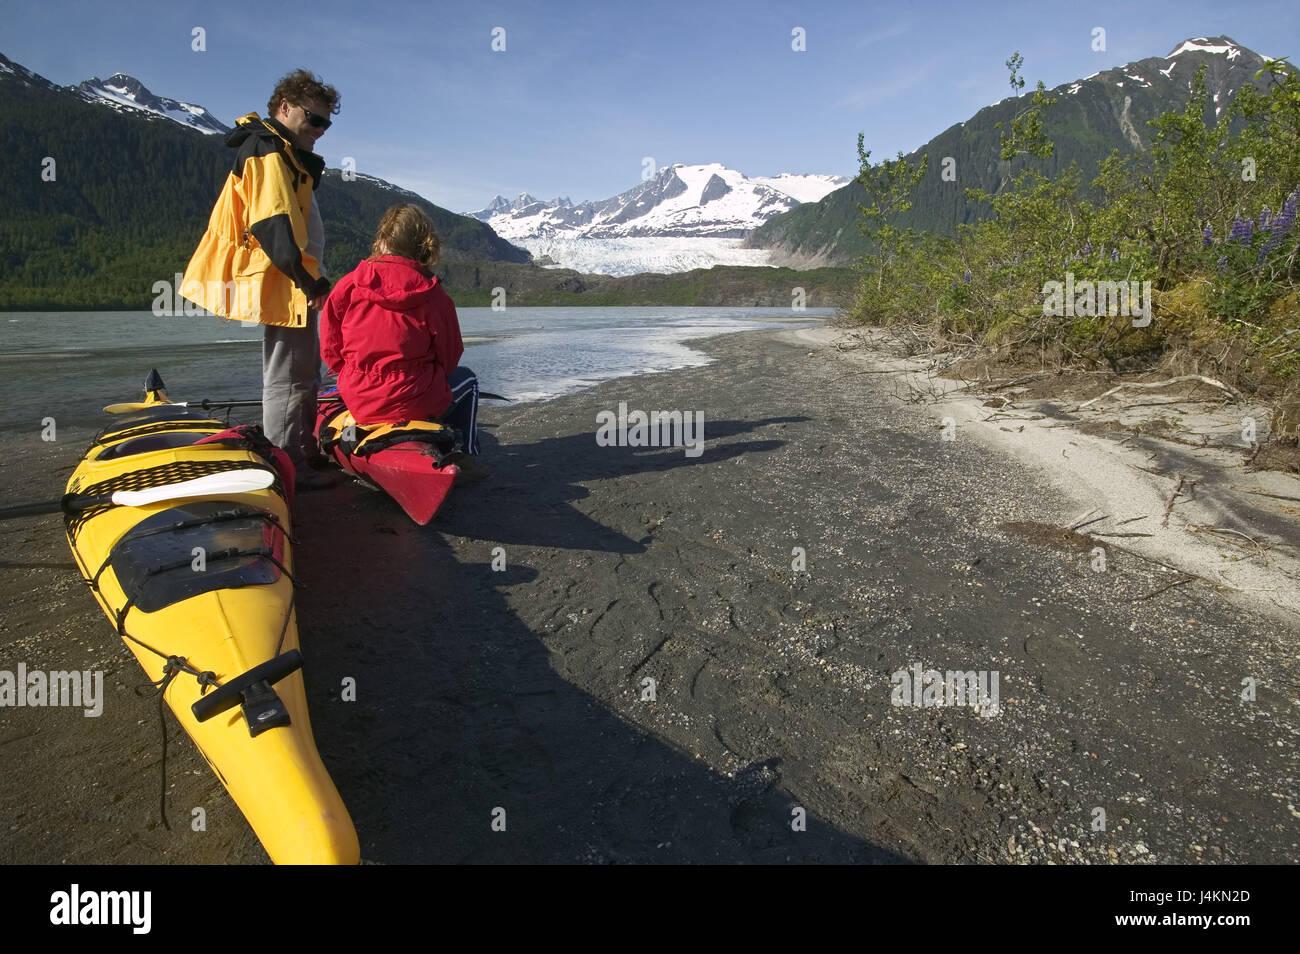 The USA, Alaska, Inside passage, Juneau, Mendenhall brine, shore, kayaks, couple, break North America, the United - Stock Image